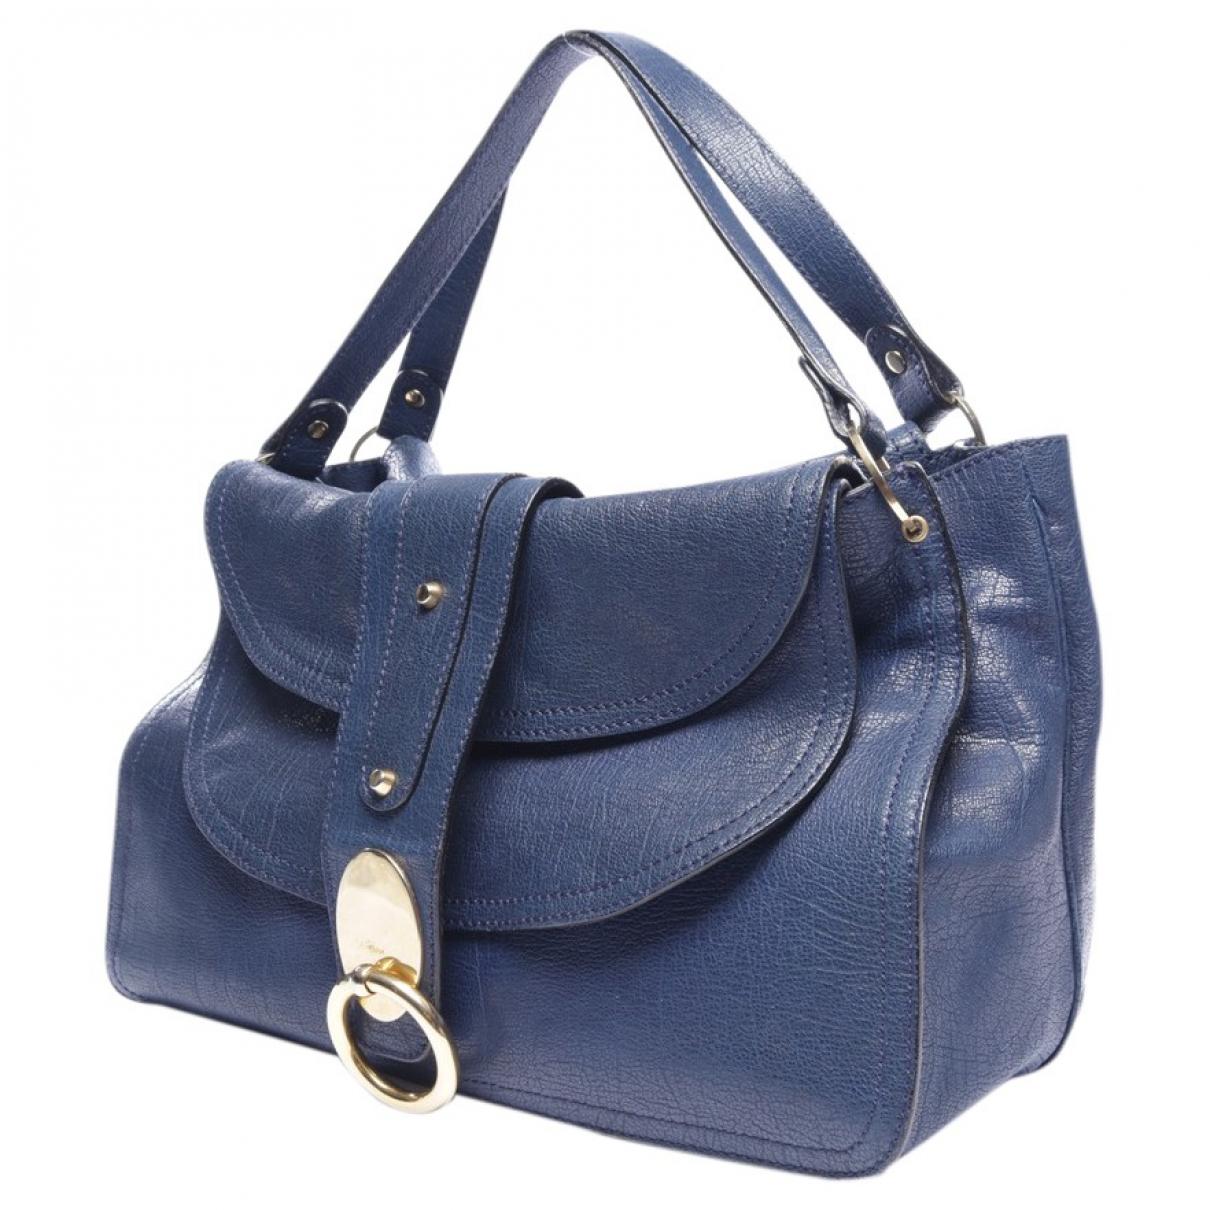 Chloé N Blue Leather handbag for Women N